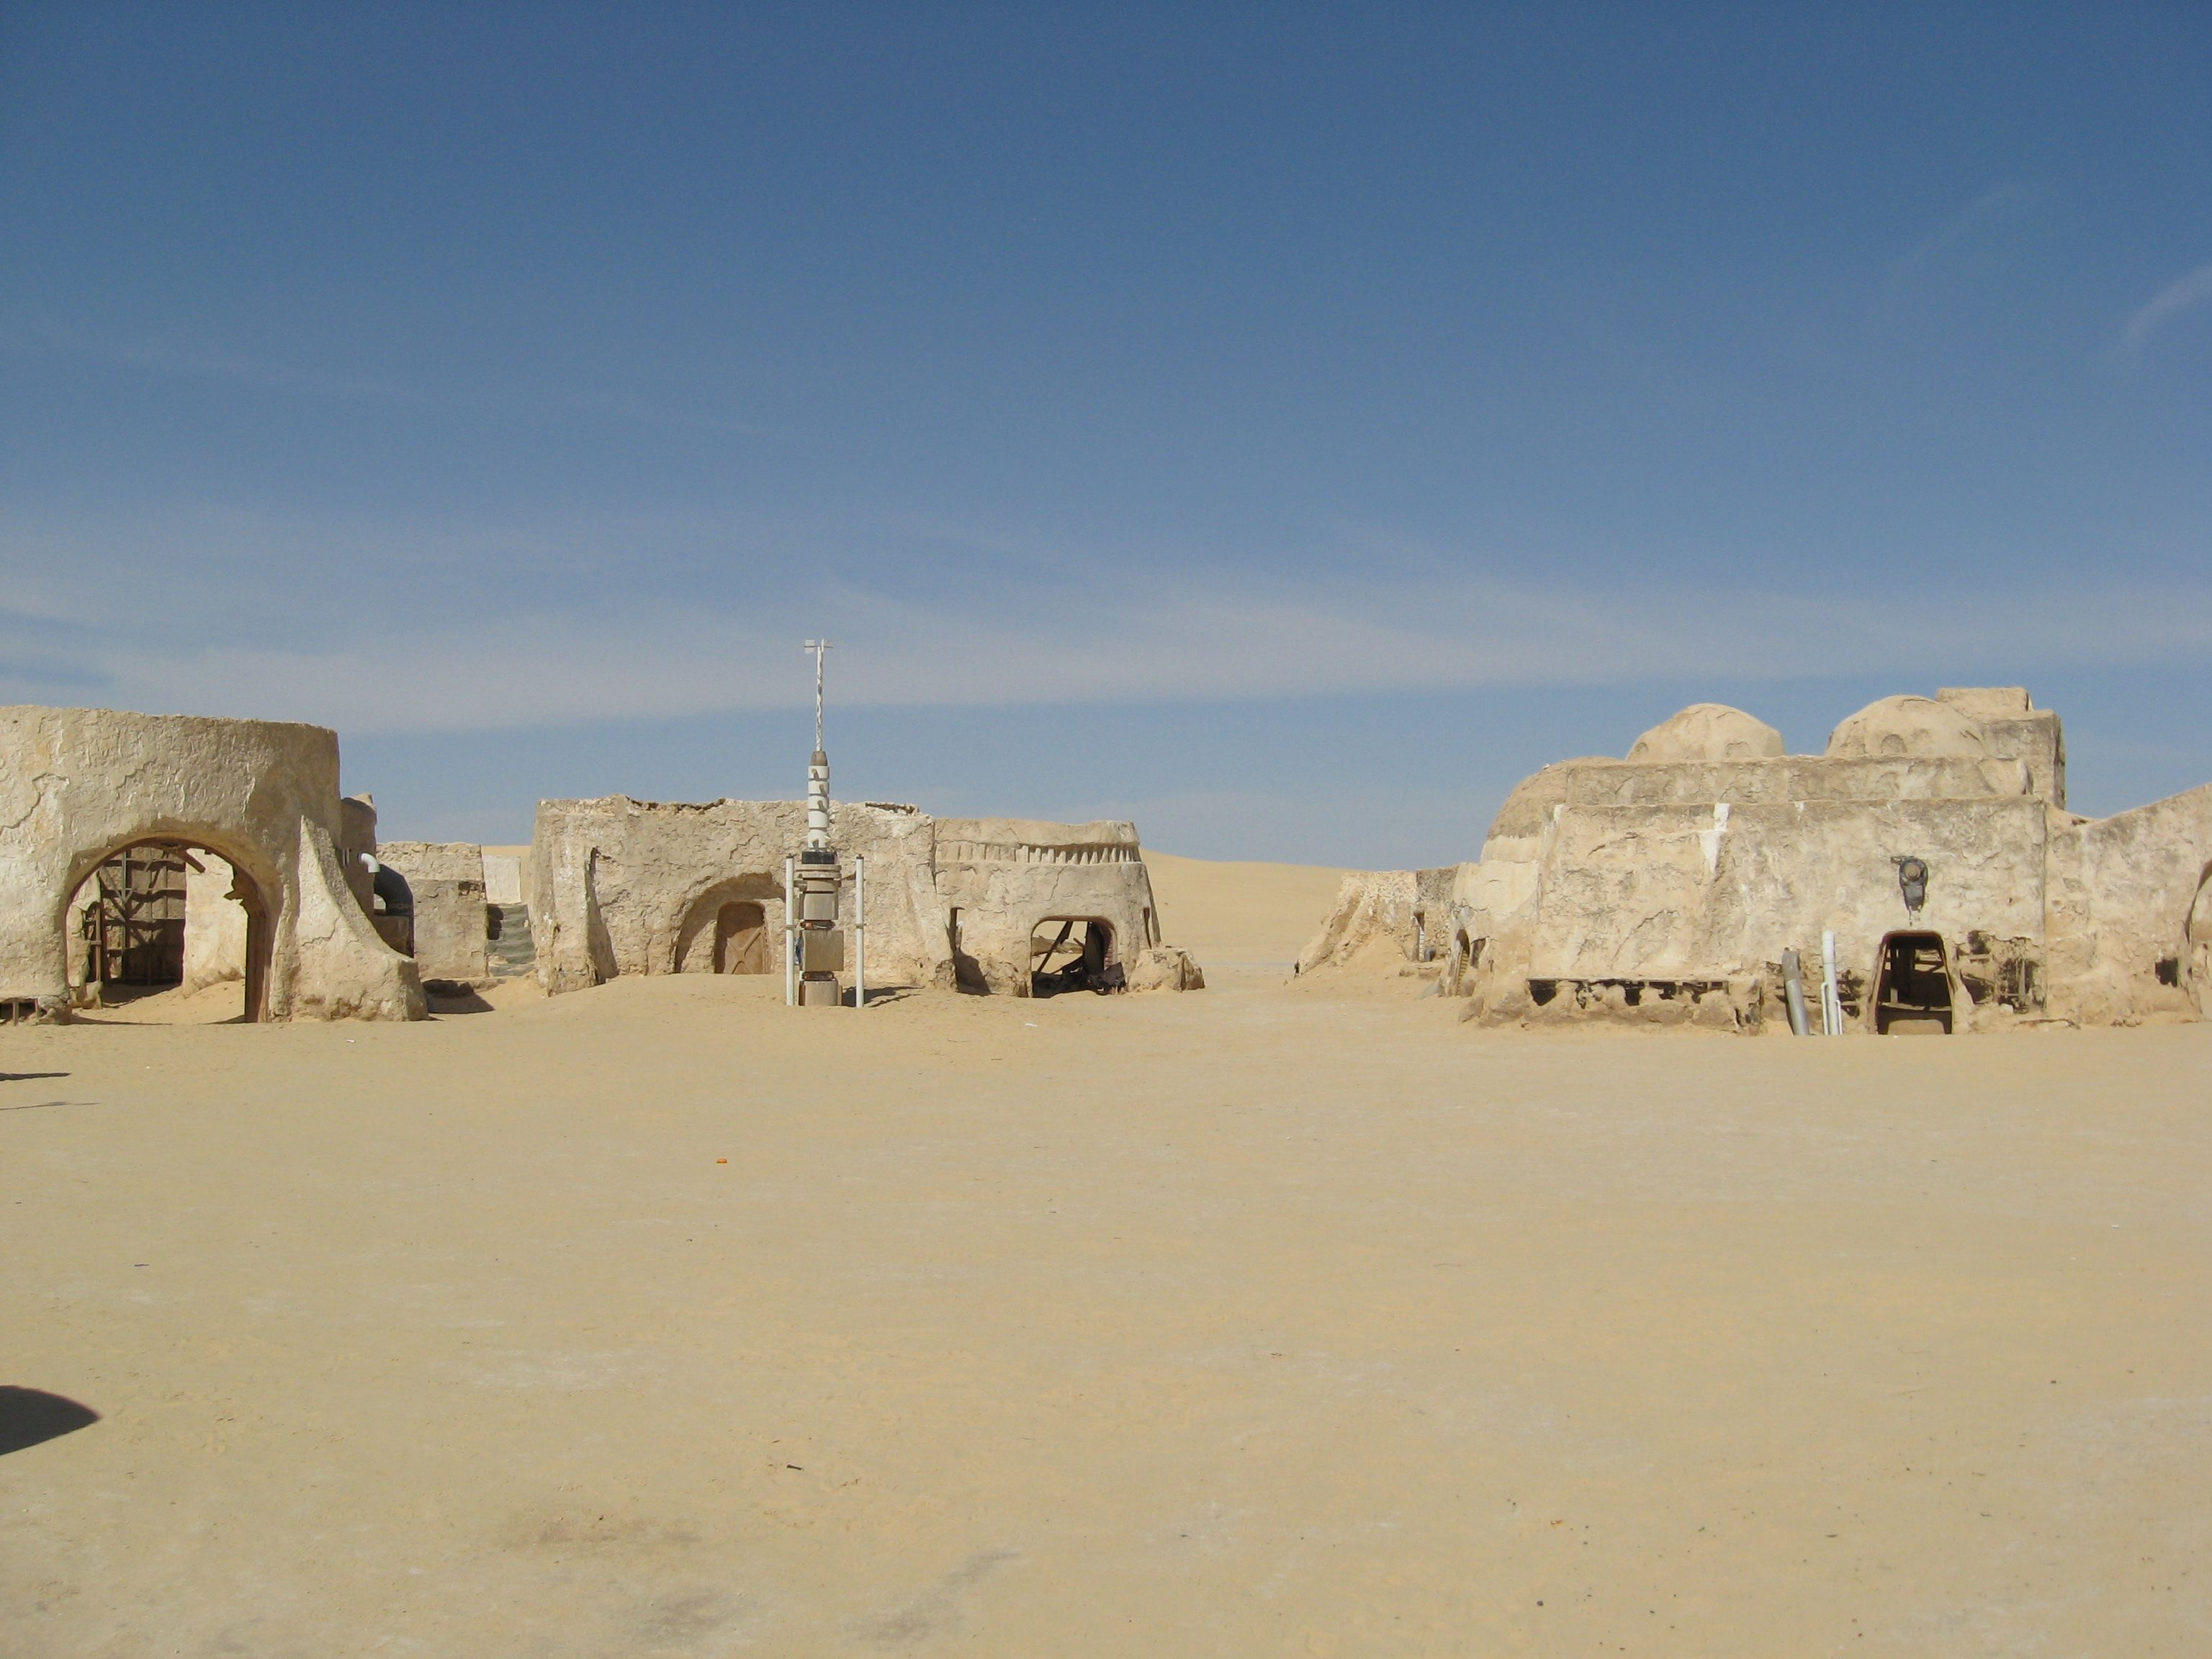 Tatooine Wallpapers Wallpapers HD Wallpapers